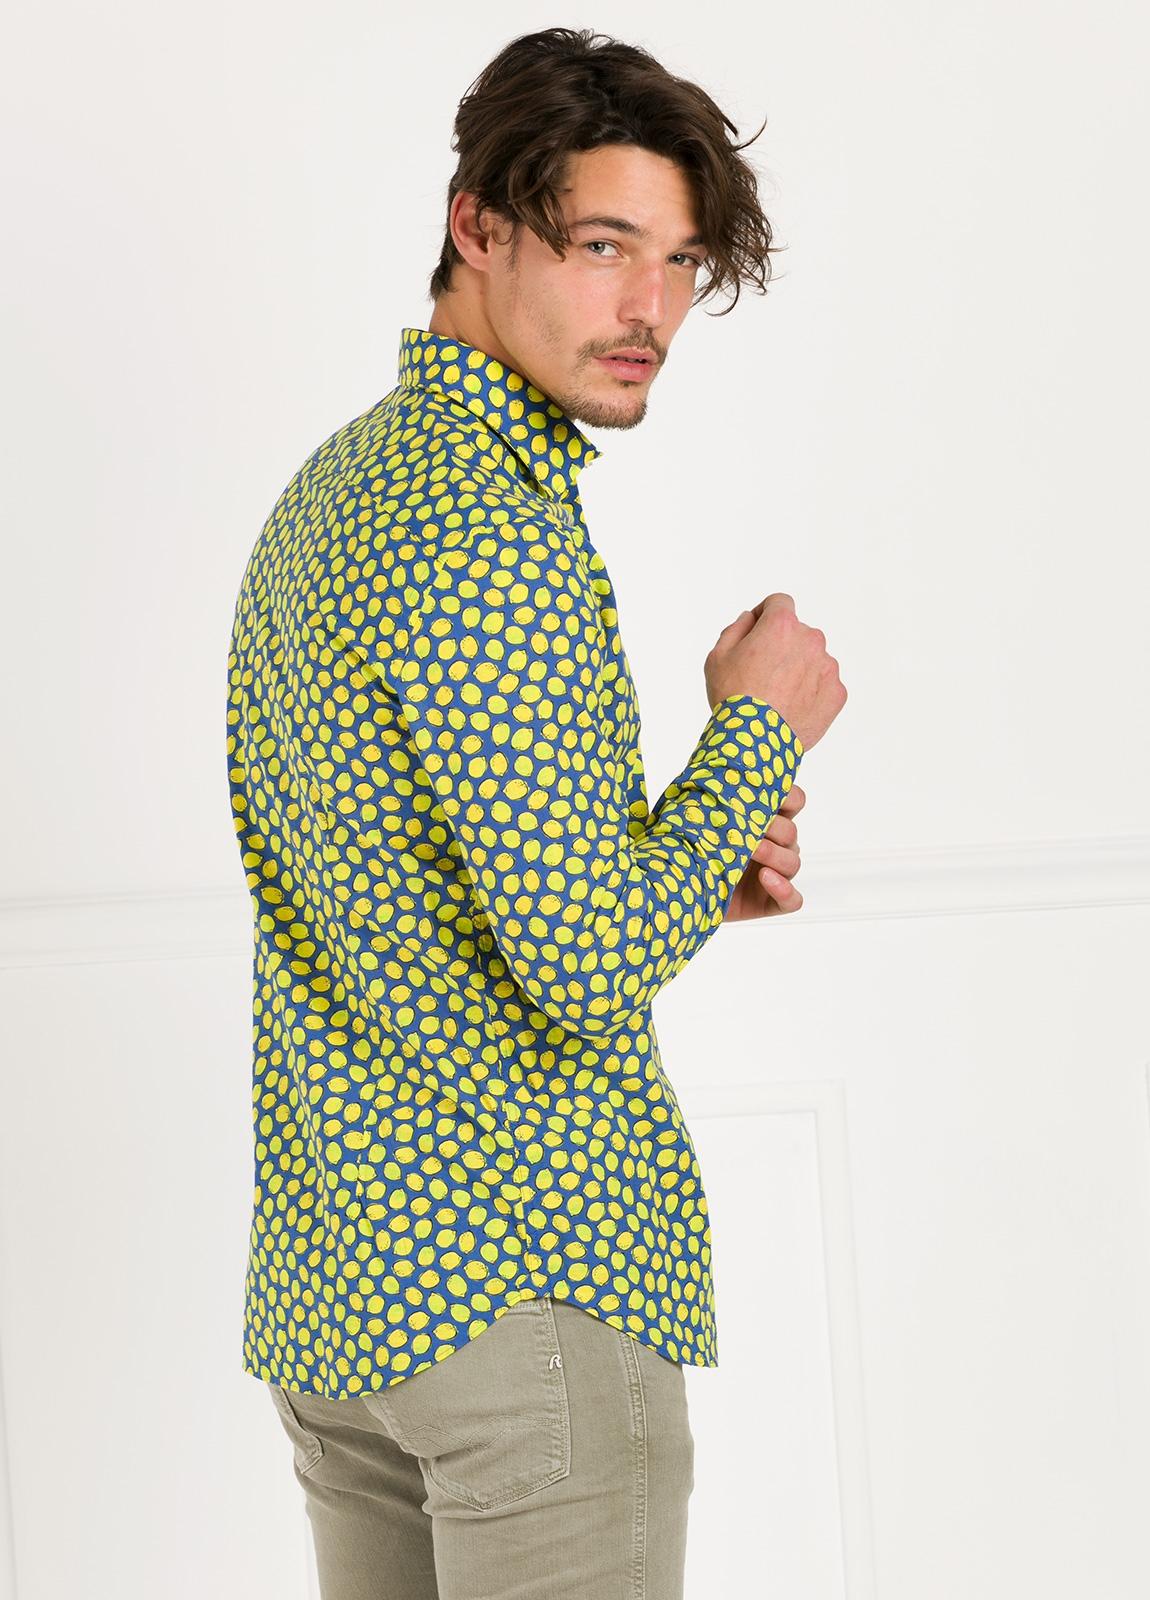 Camisa Leisure Wear SLIM FIT modelo PORTO estampado limones. 100% Algodón. - Ítem1